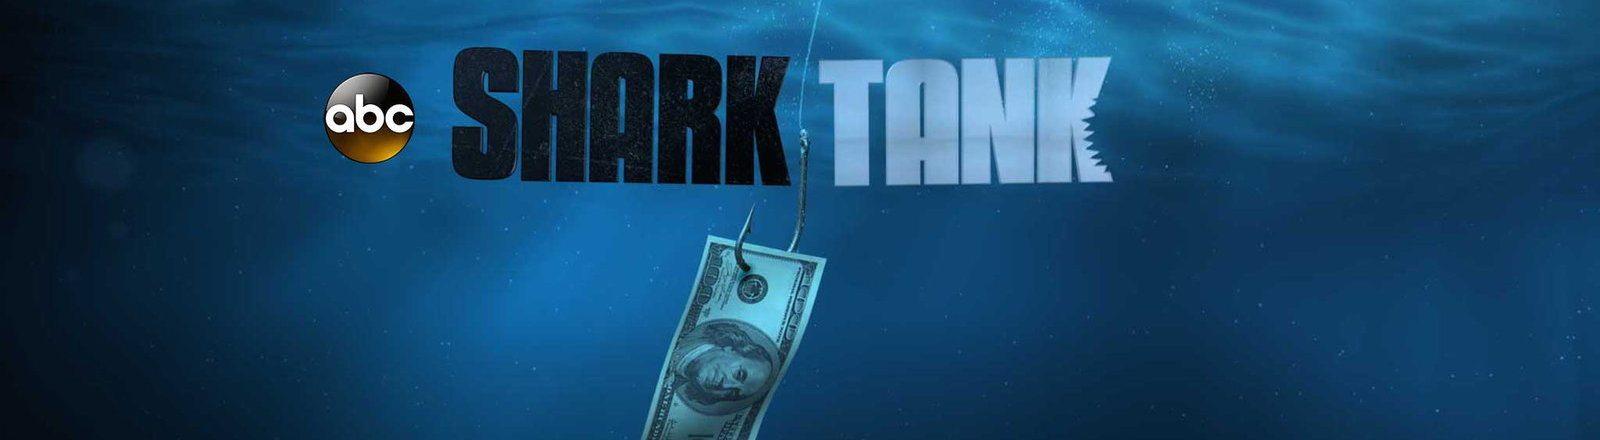 Apply to be on Shark Tank